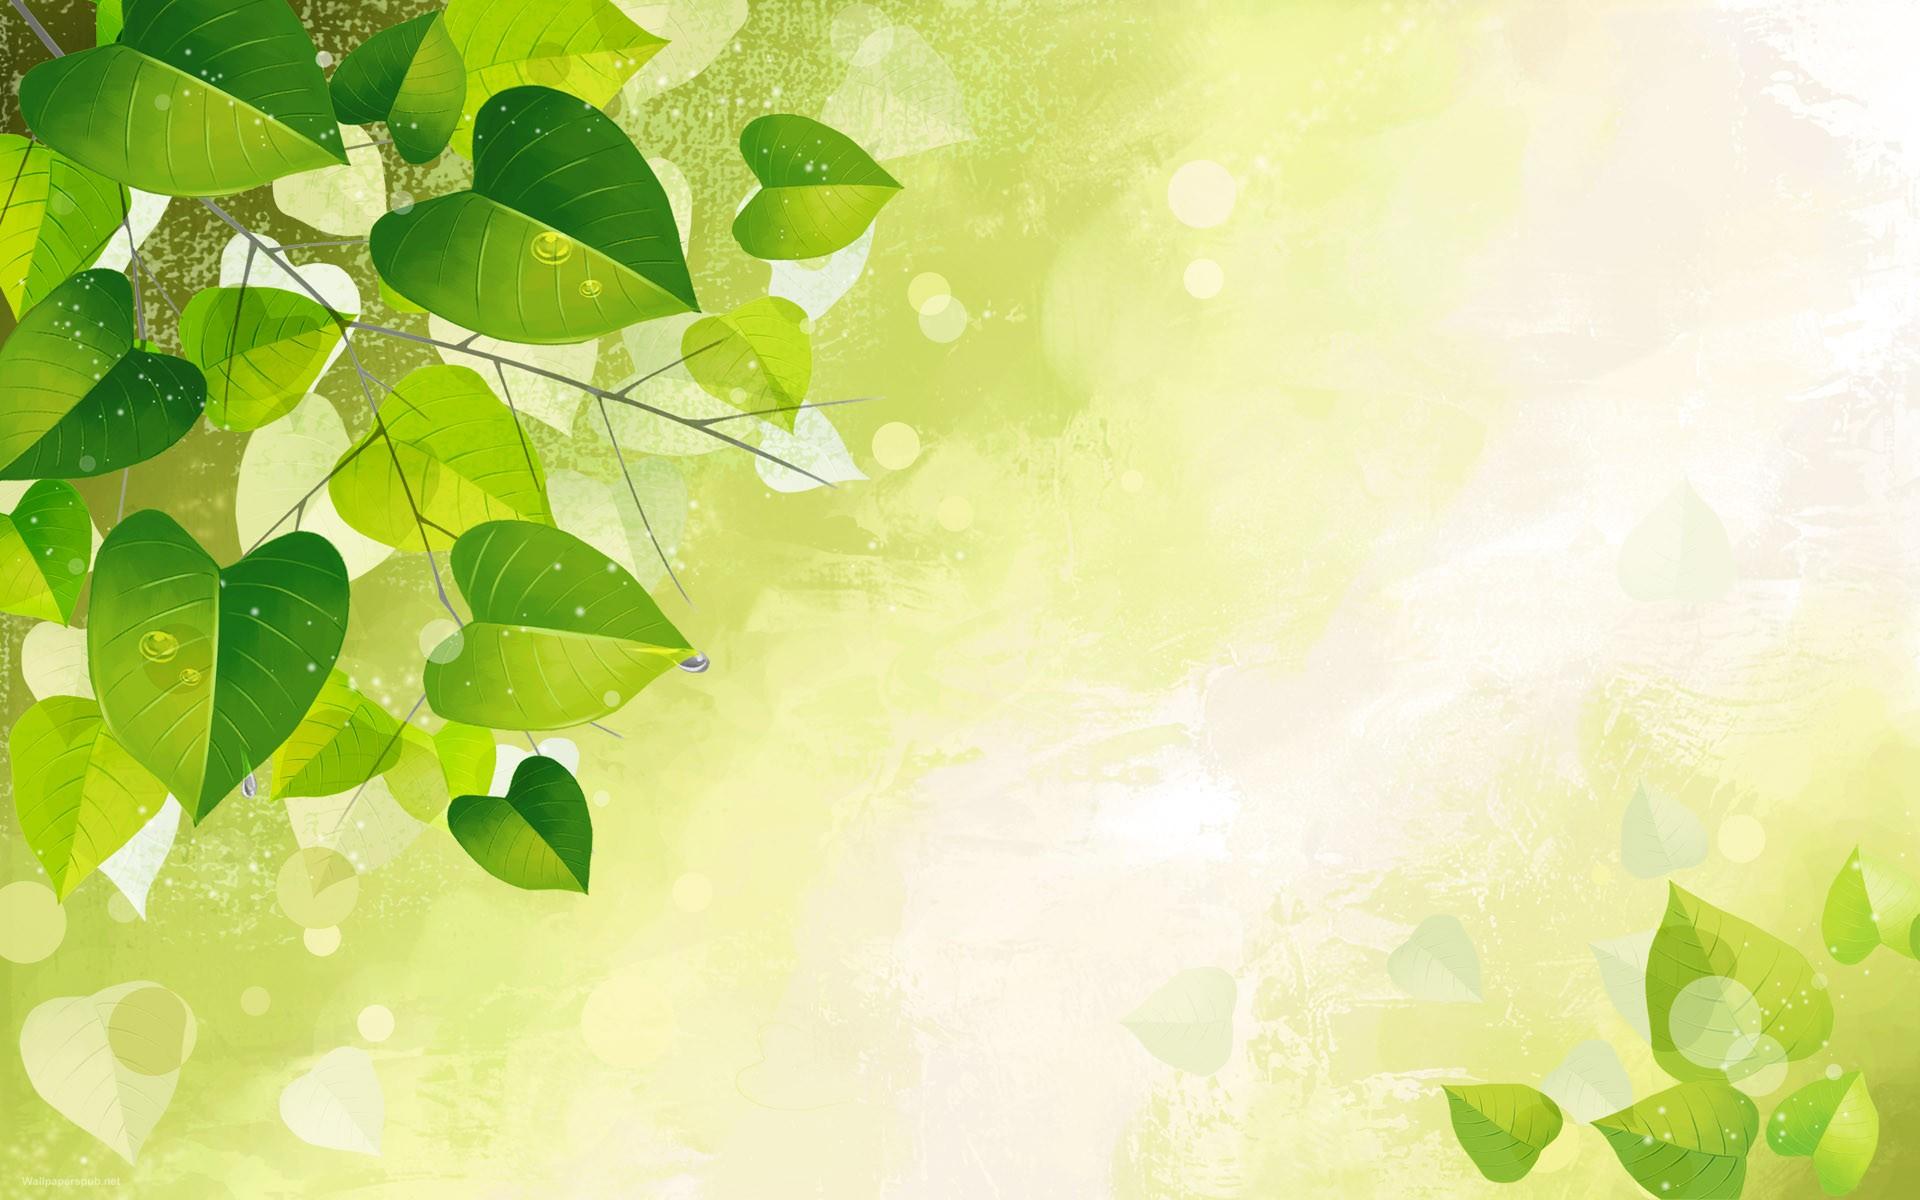 Vector Art Leaf Wallpaper HD Wallpaper Vector Designs Wallpapers 1920x1200